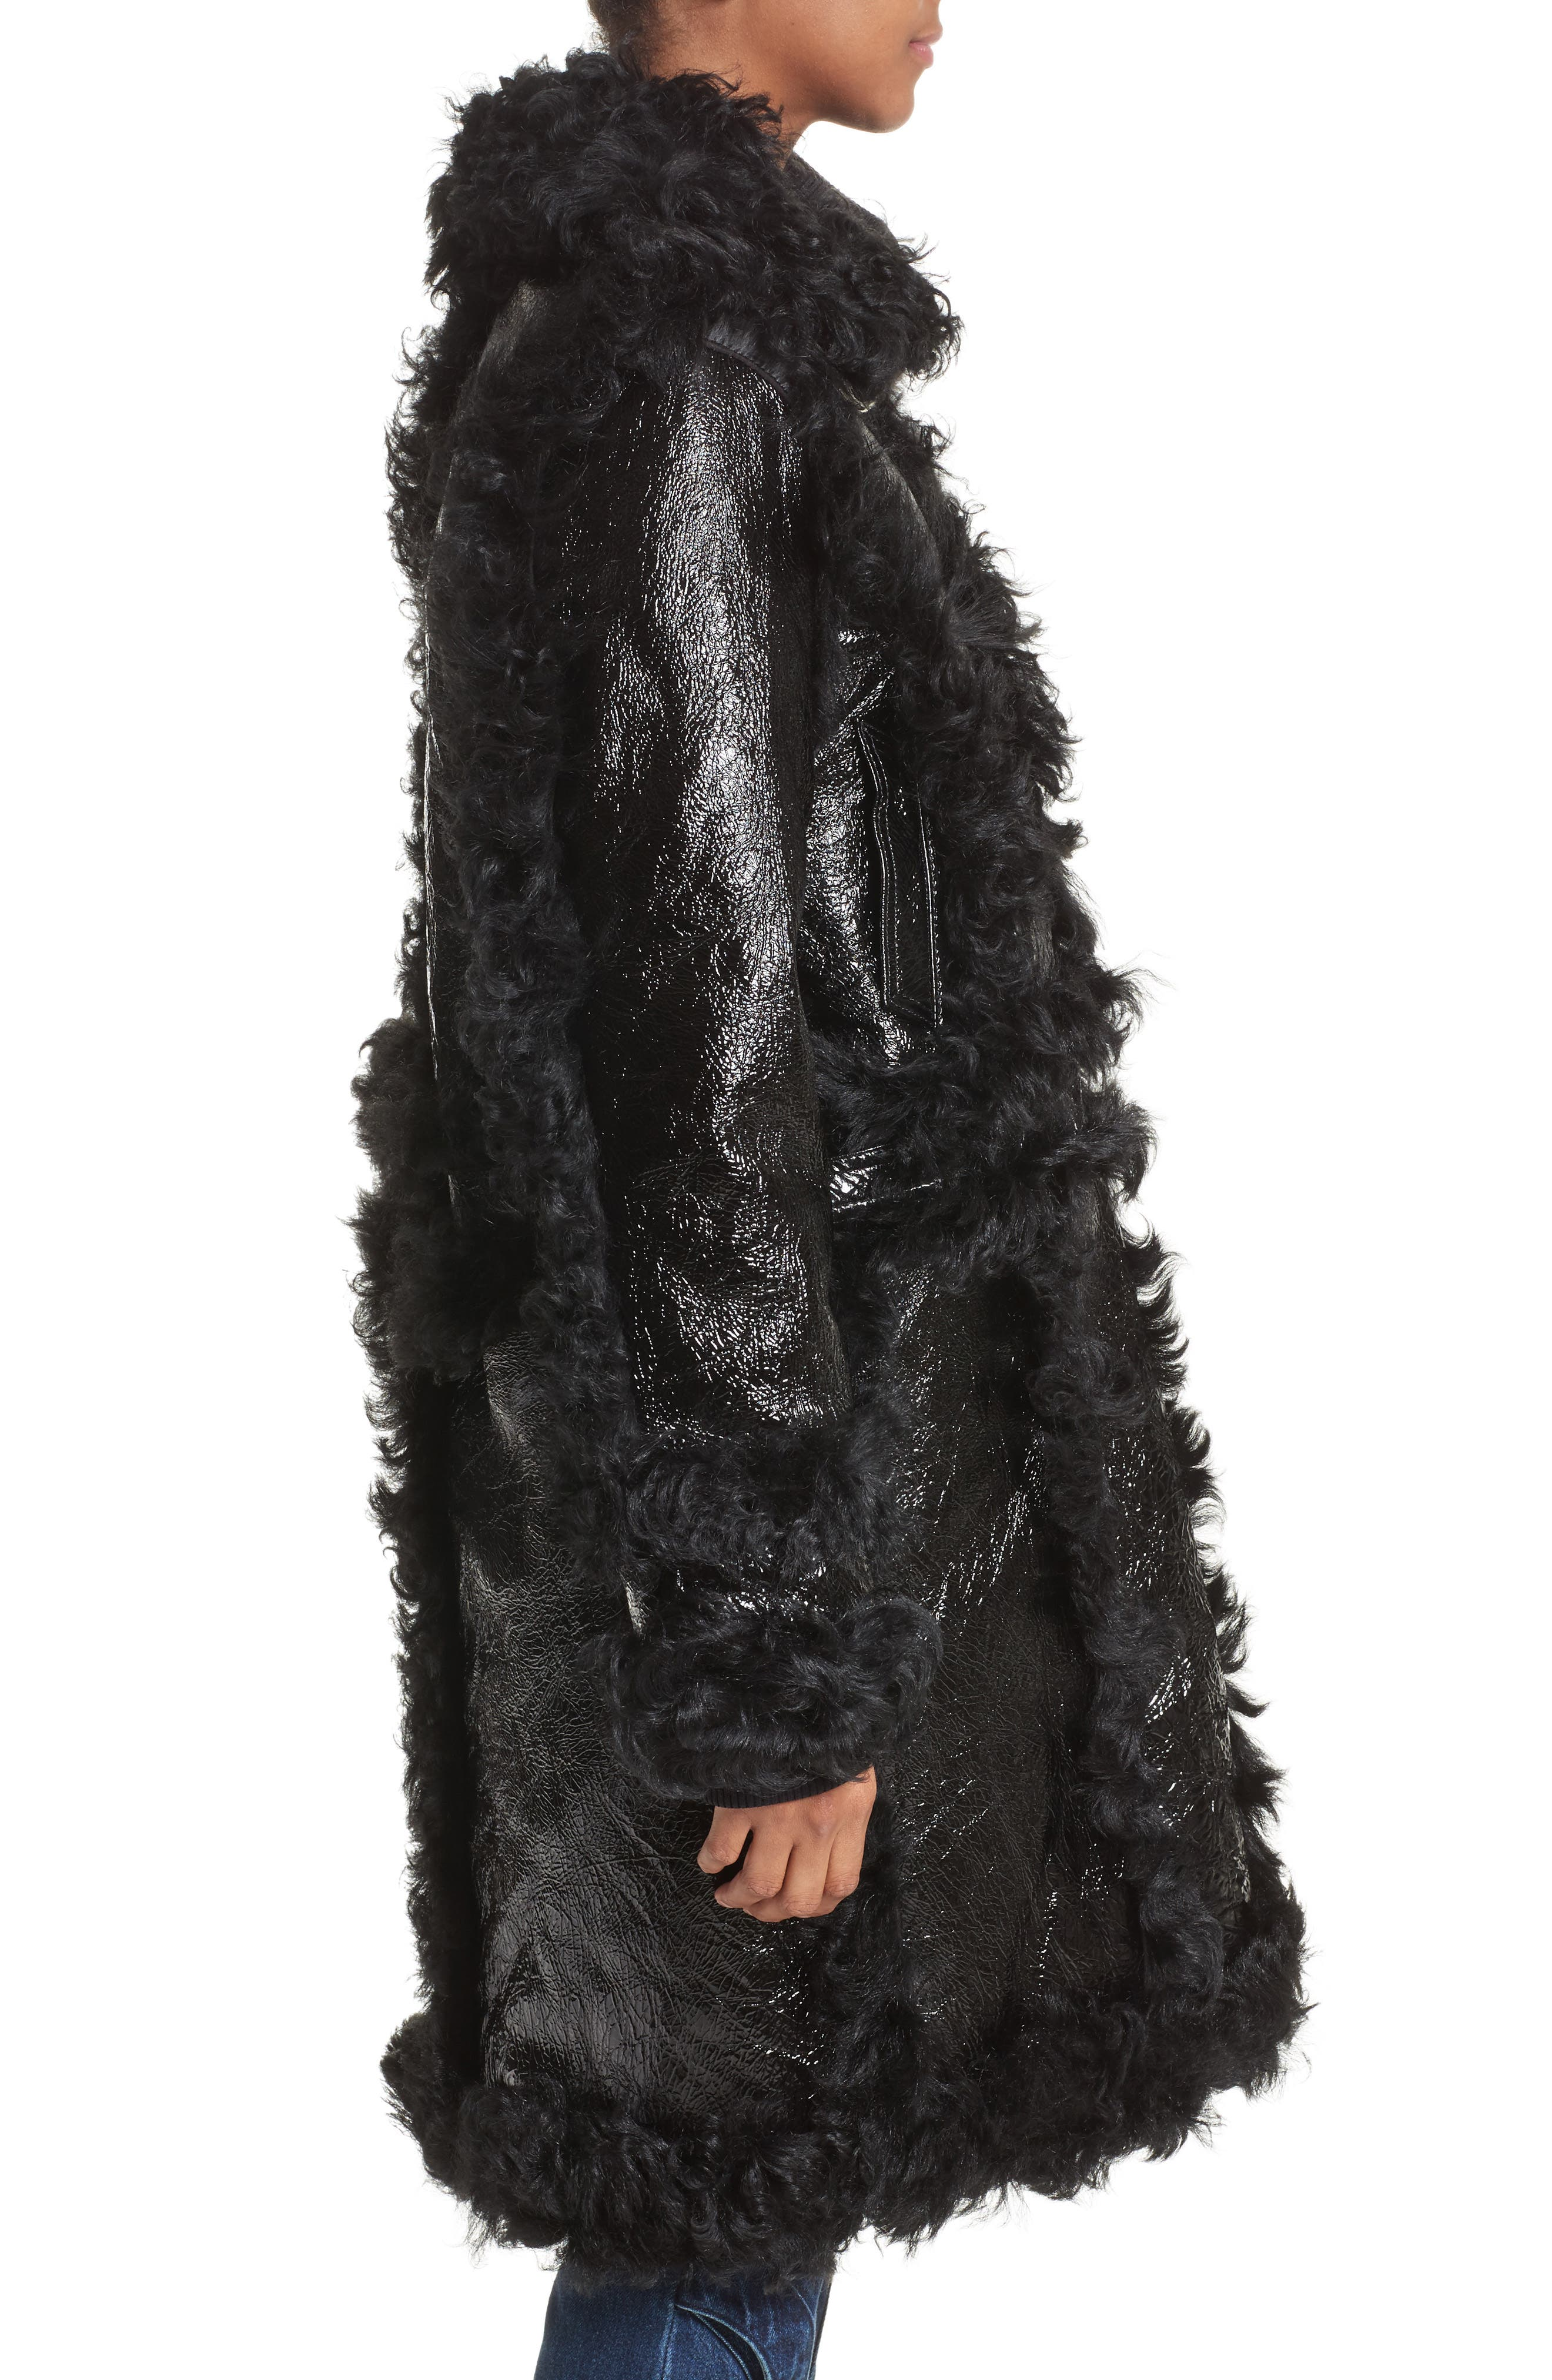 Marques'Almeida Foiled Genuine Shearling Coat,                             Alternate thumbnail 4, color,                             Black/Black